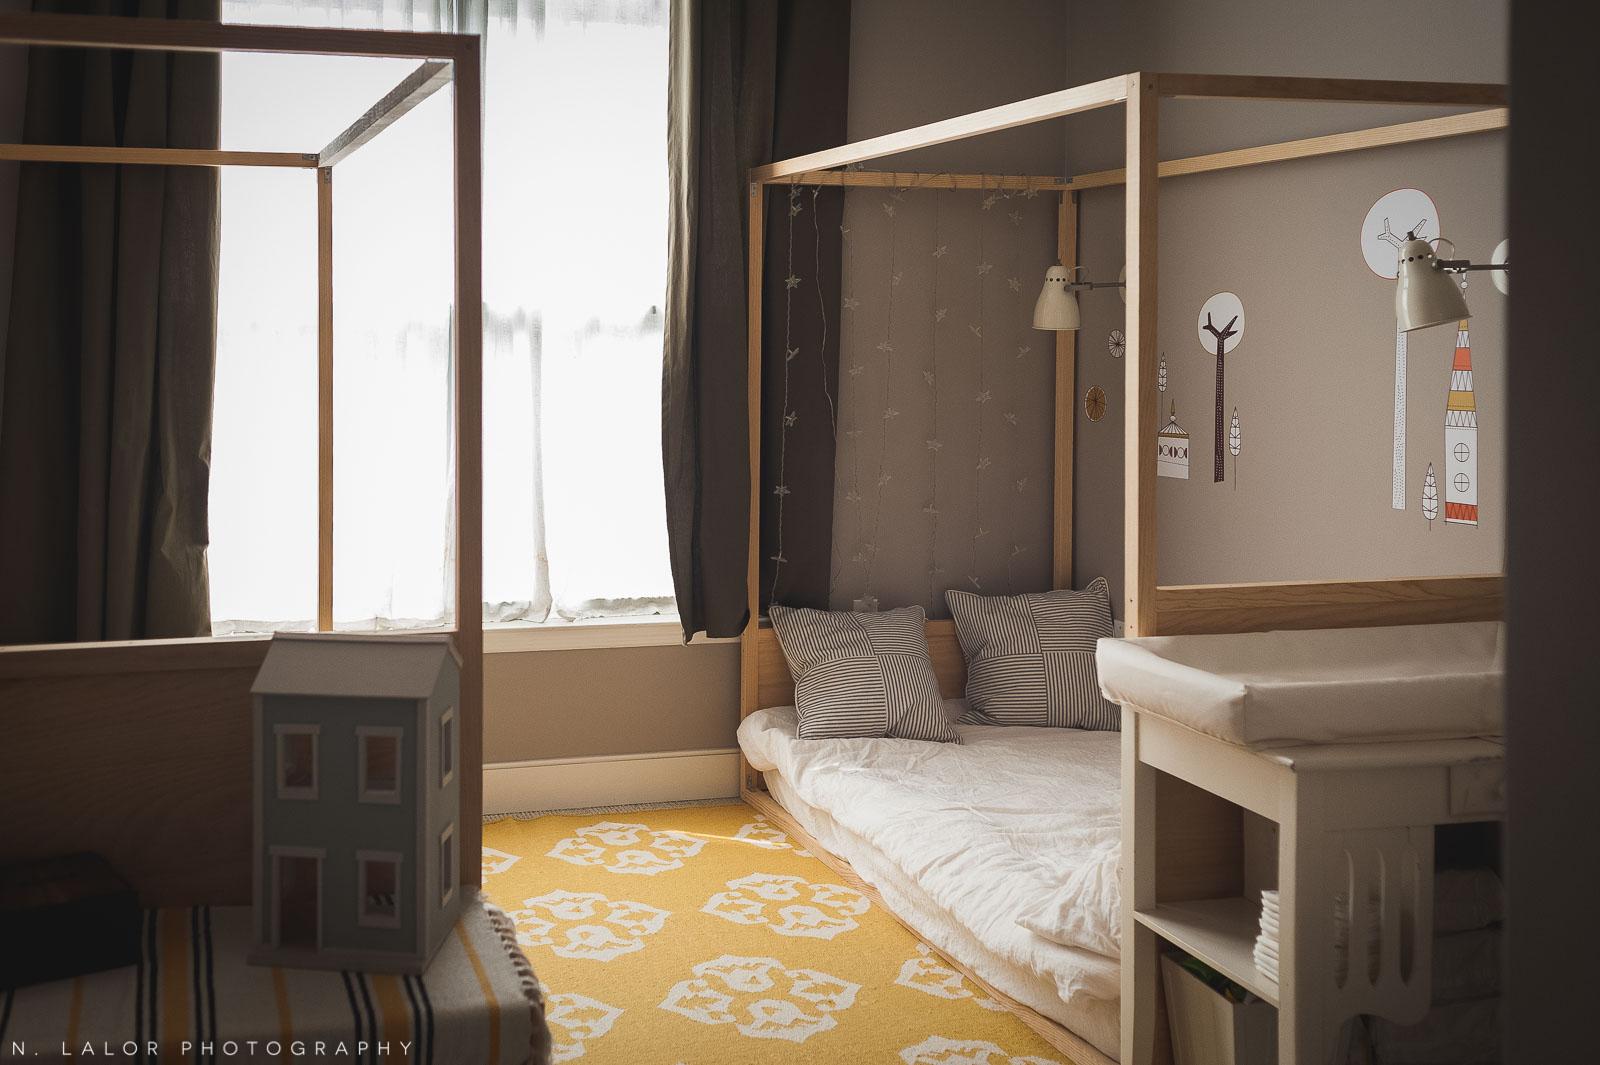 A Shared Kids Bedroom With DIY Montessori Floor Beds